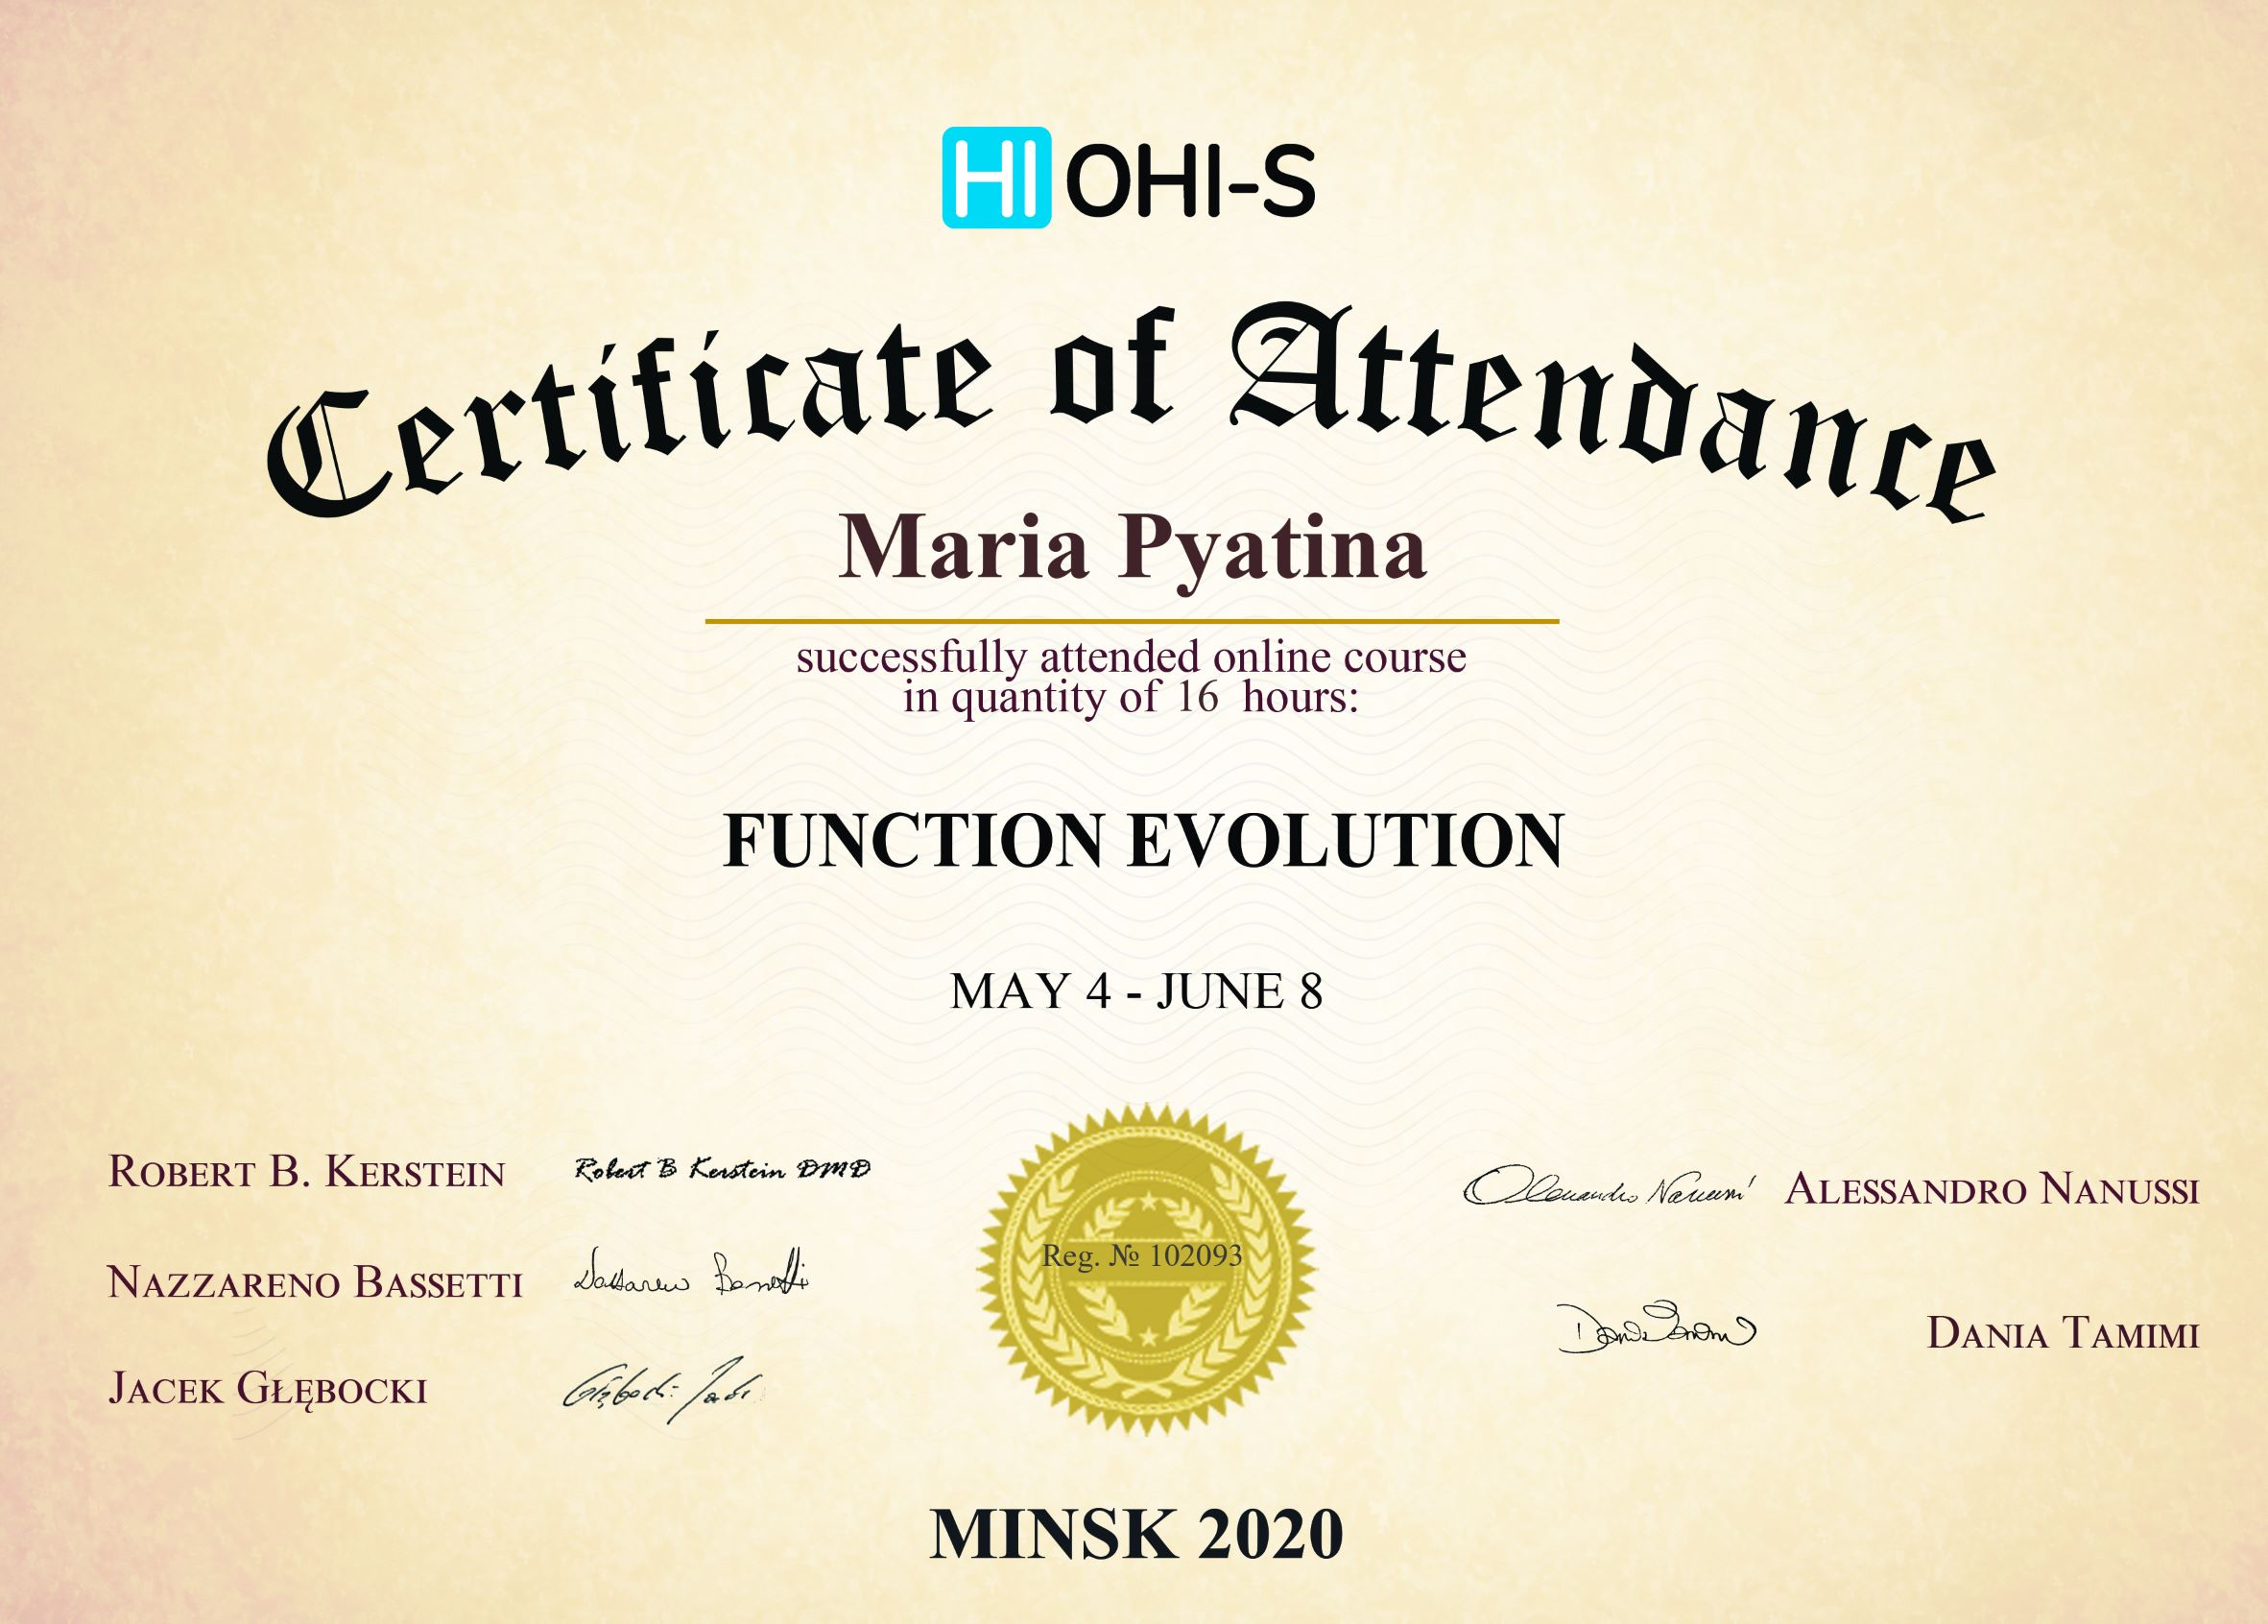 2020, HI OHI-S, Minsk